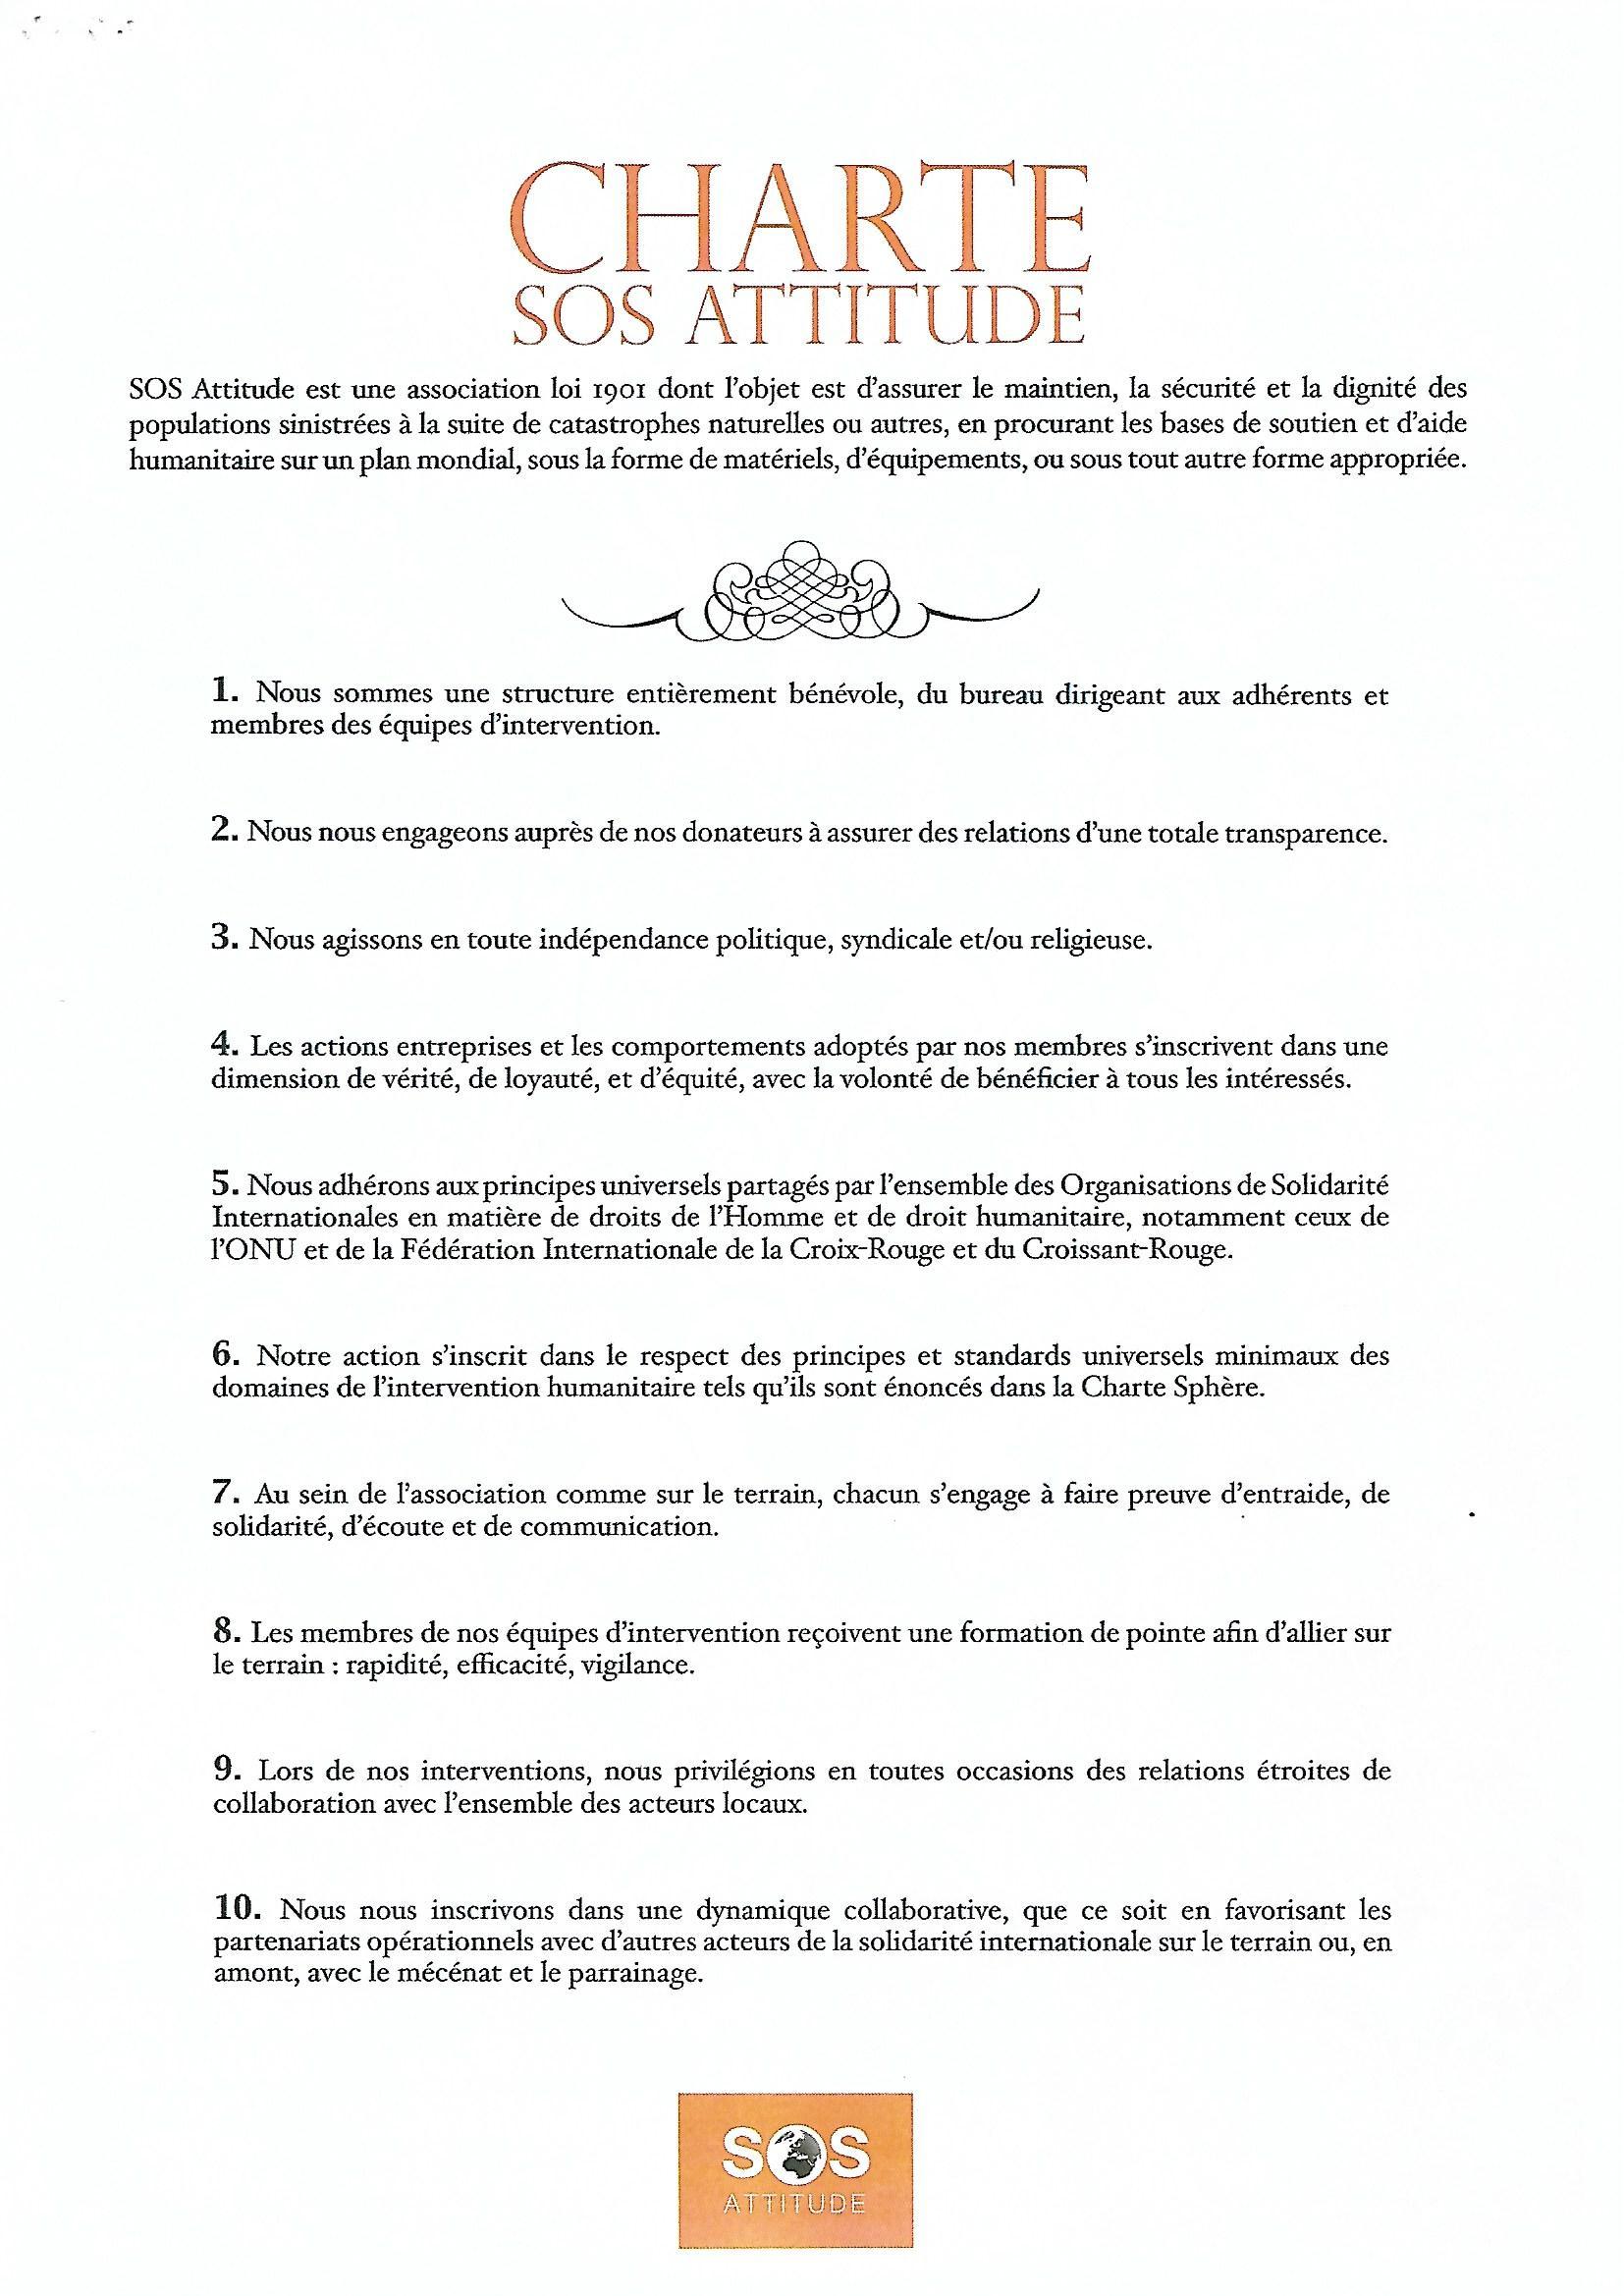 Charte SOS.jpg